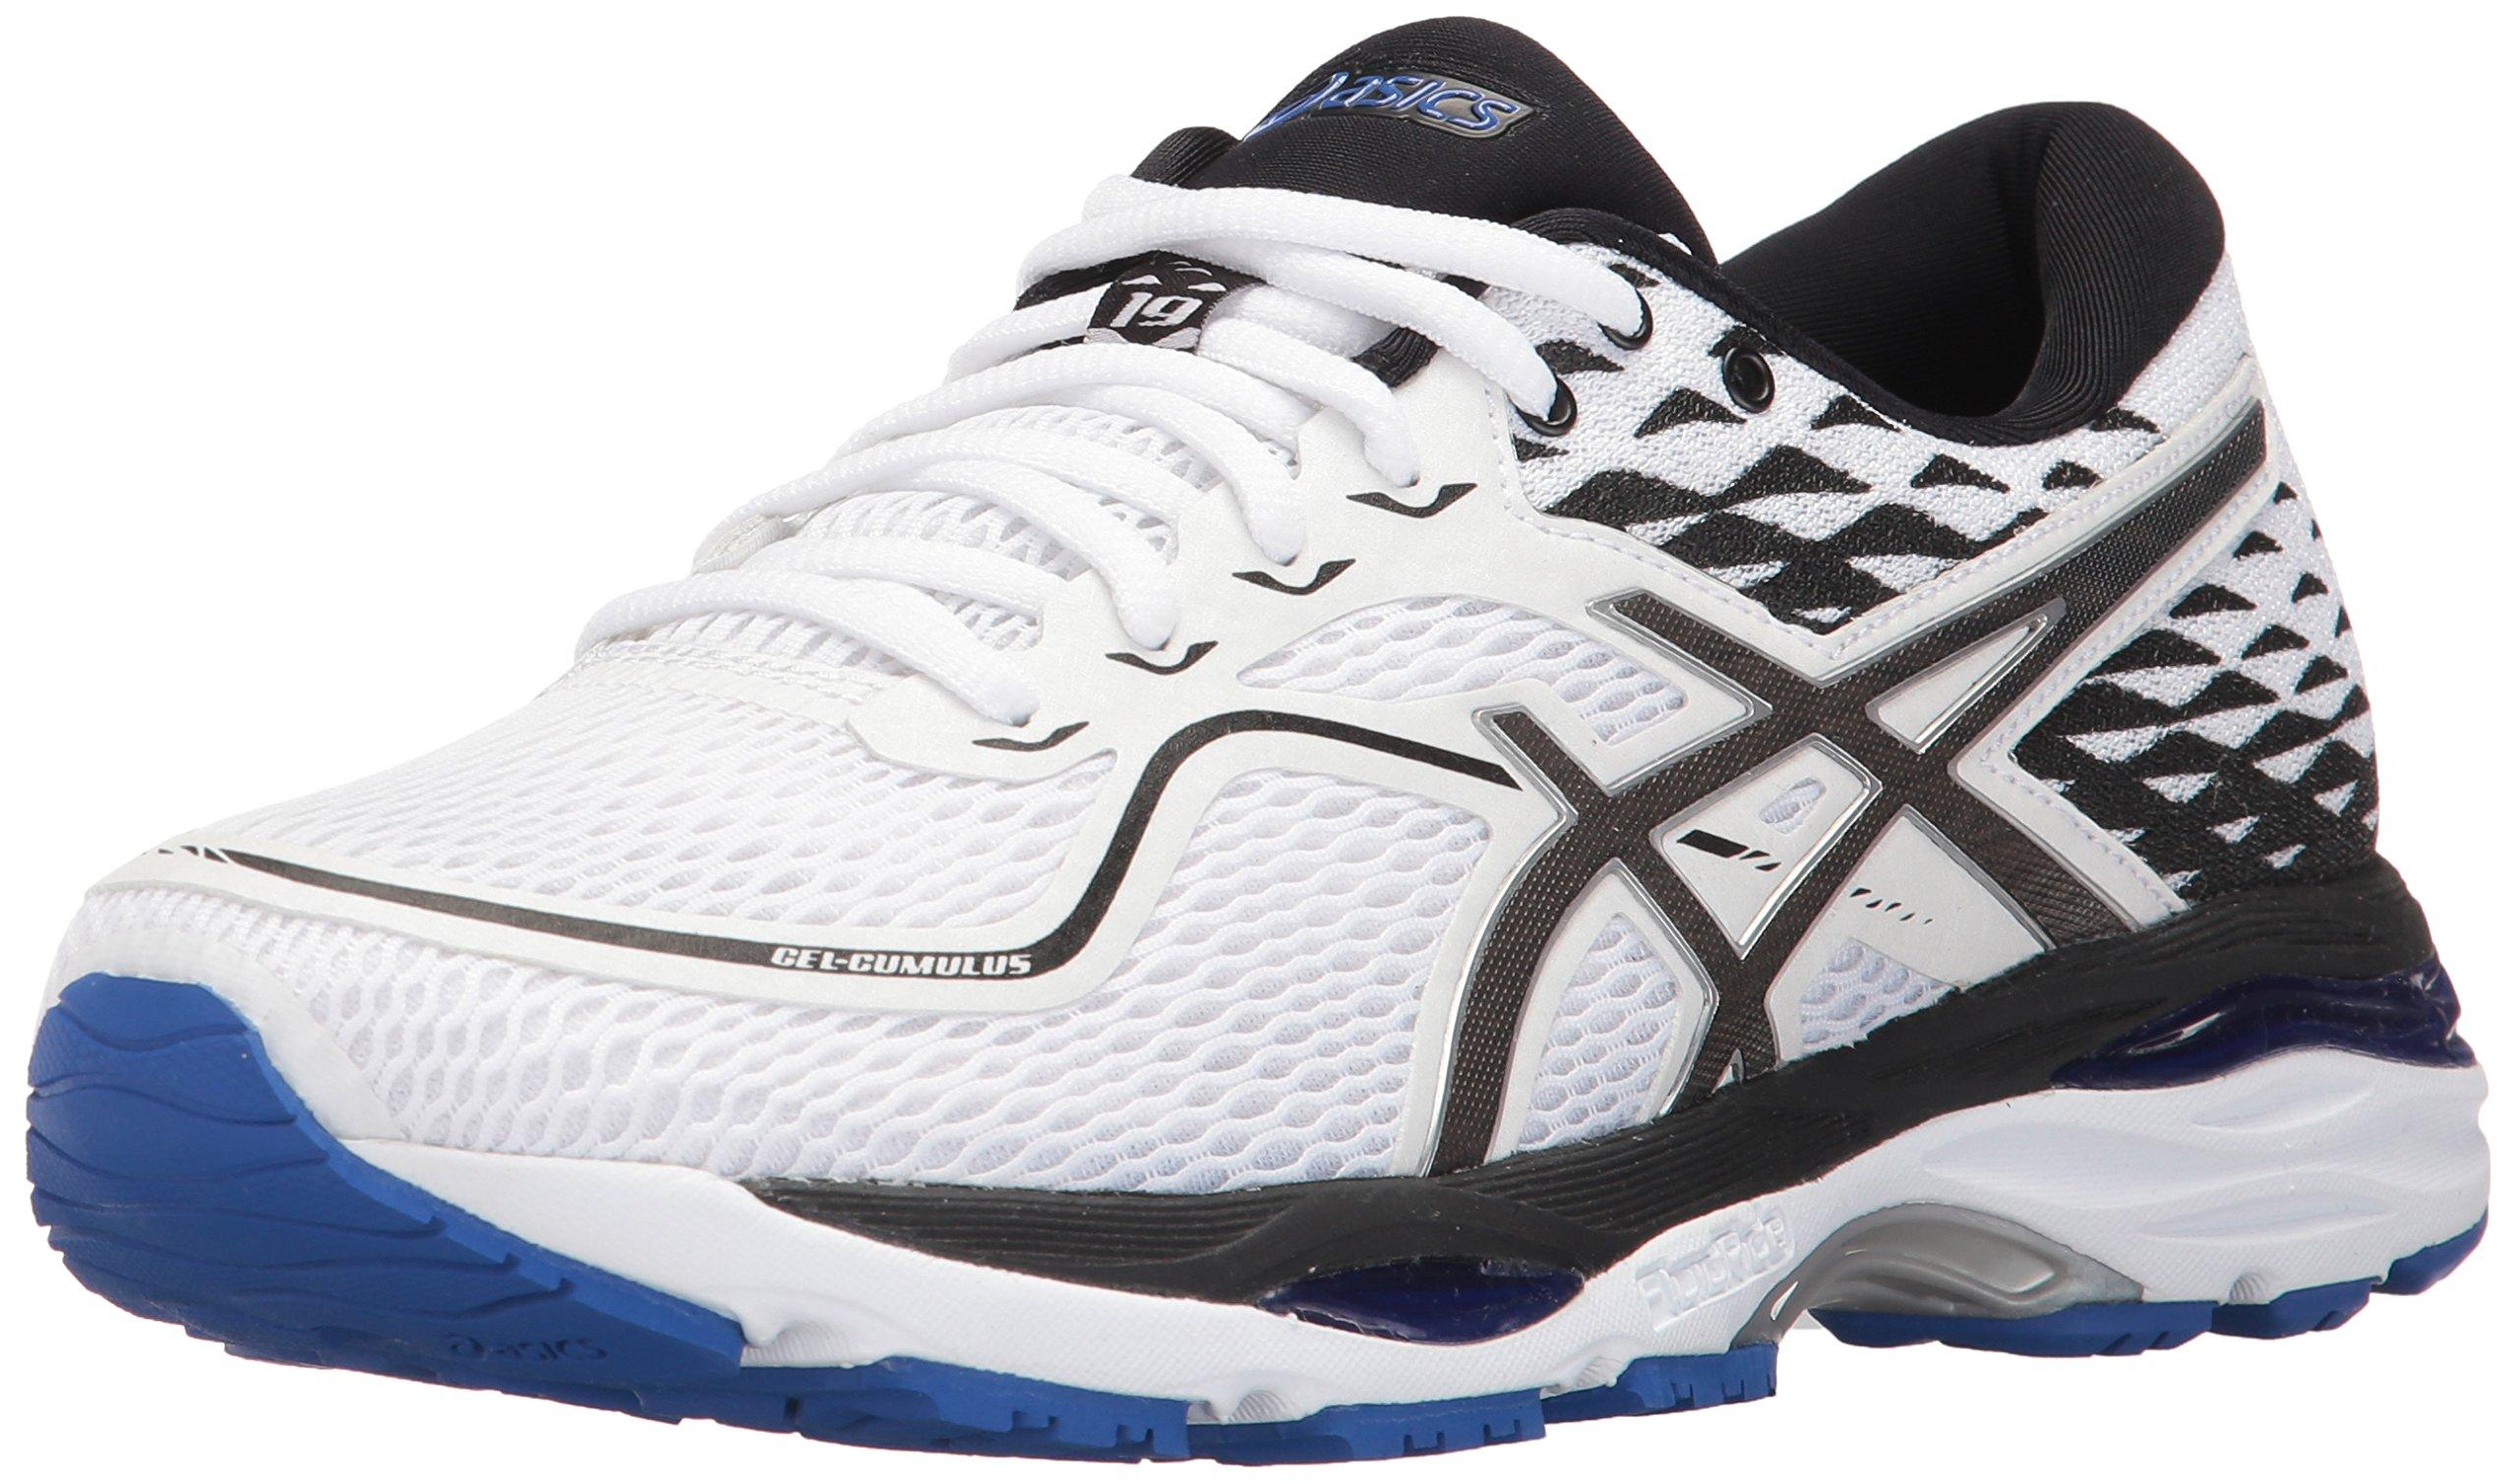 ASICS Women's Gel-Cumulus 19 Running Shoe, White/Black/Blue Purple, 7.5 Medium US